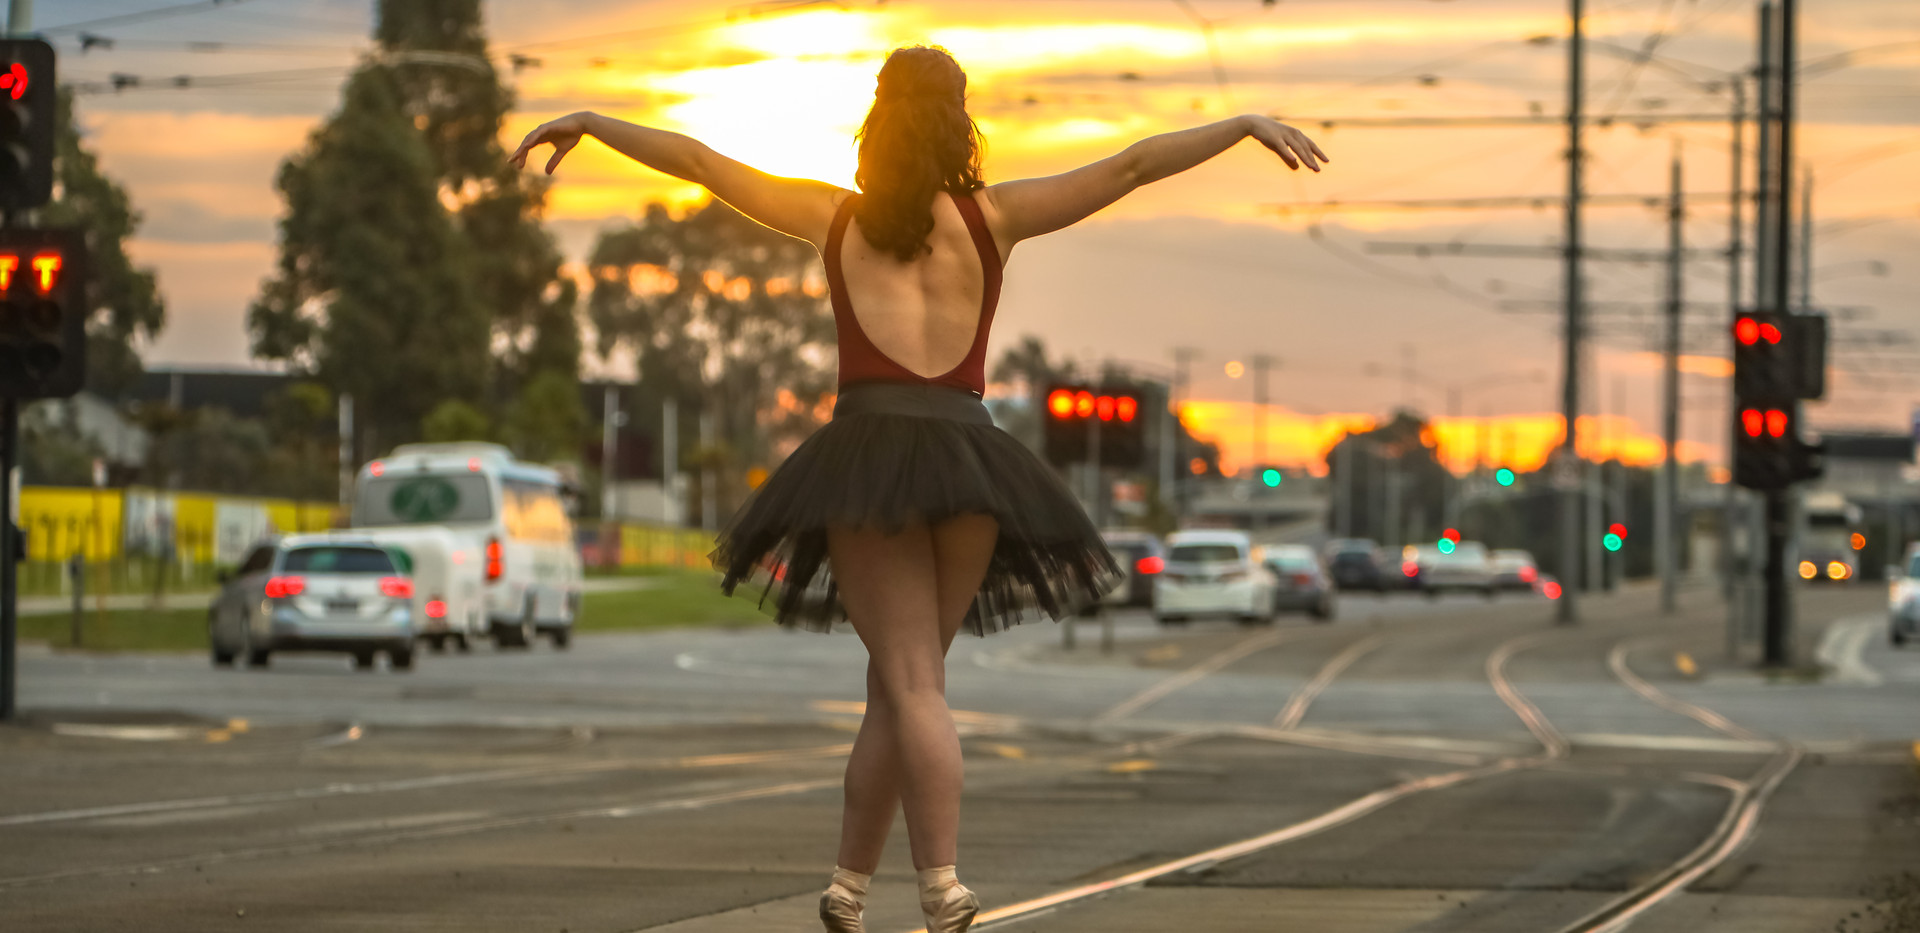 Ballet Shoot 27-5-18-4640.jpg